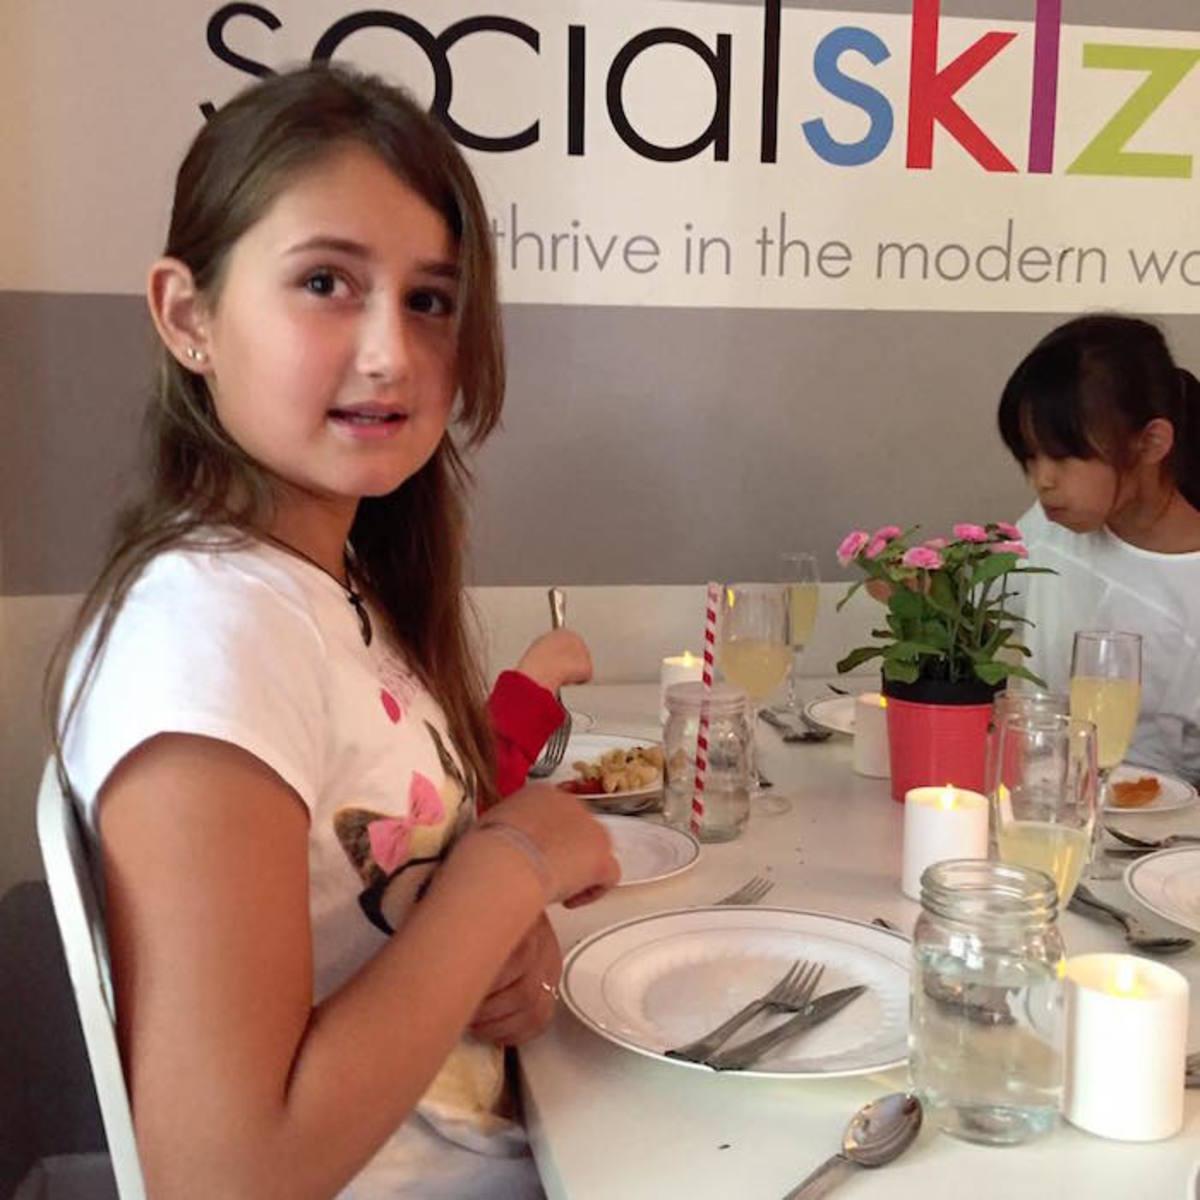 Socialsklz